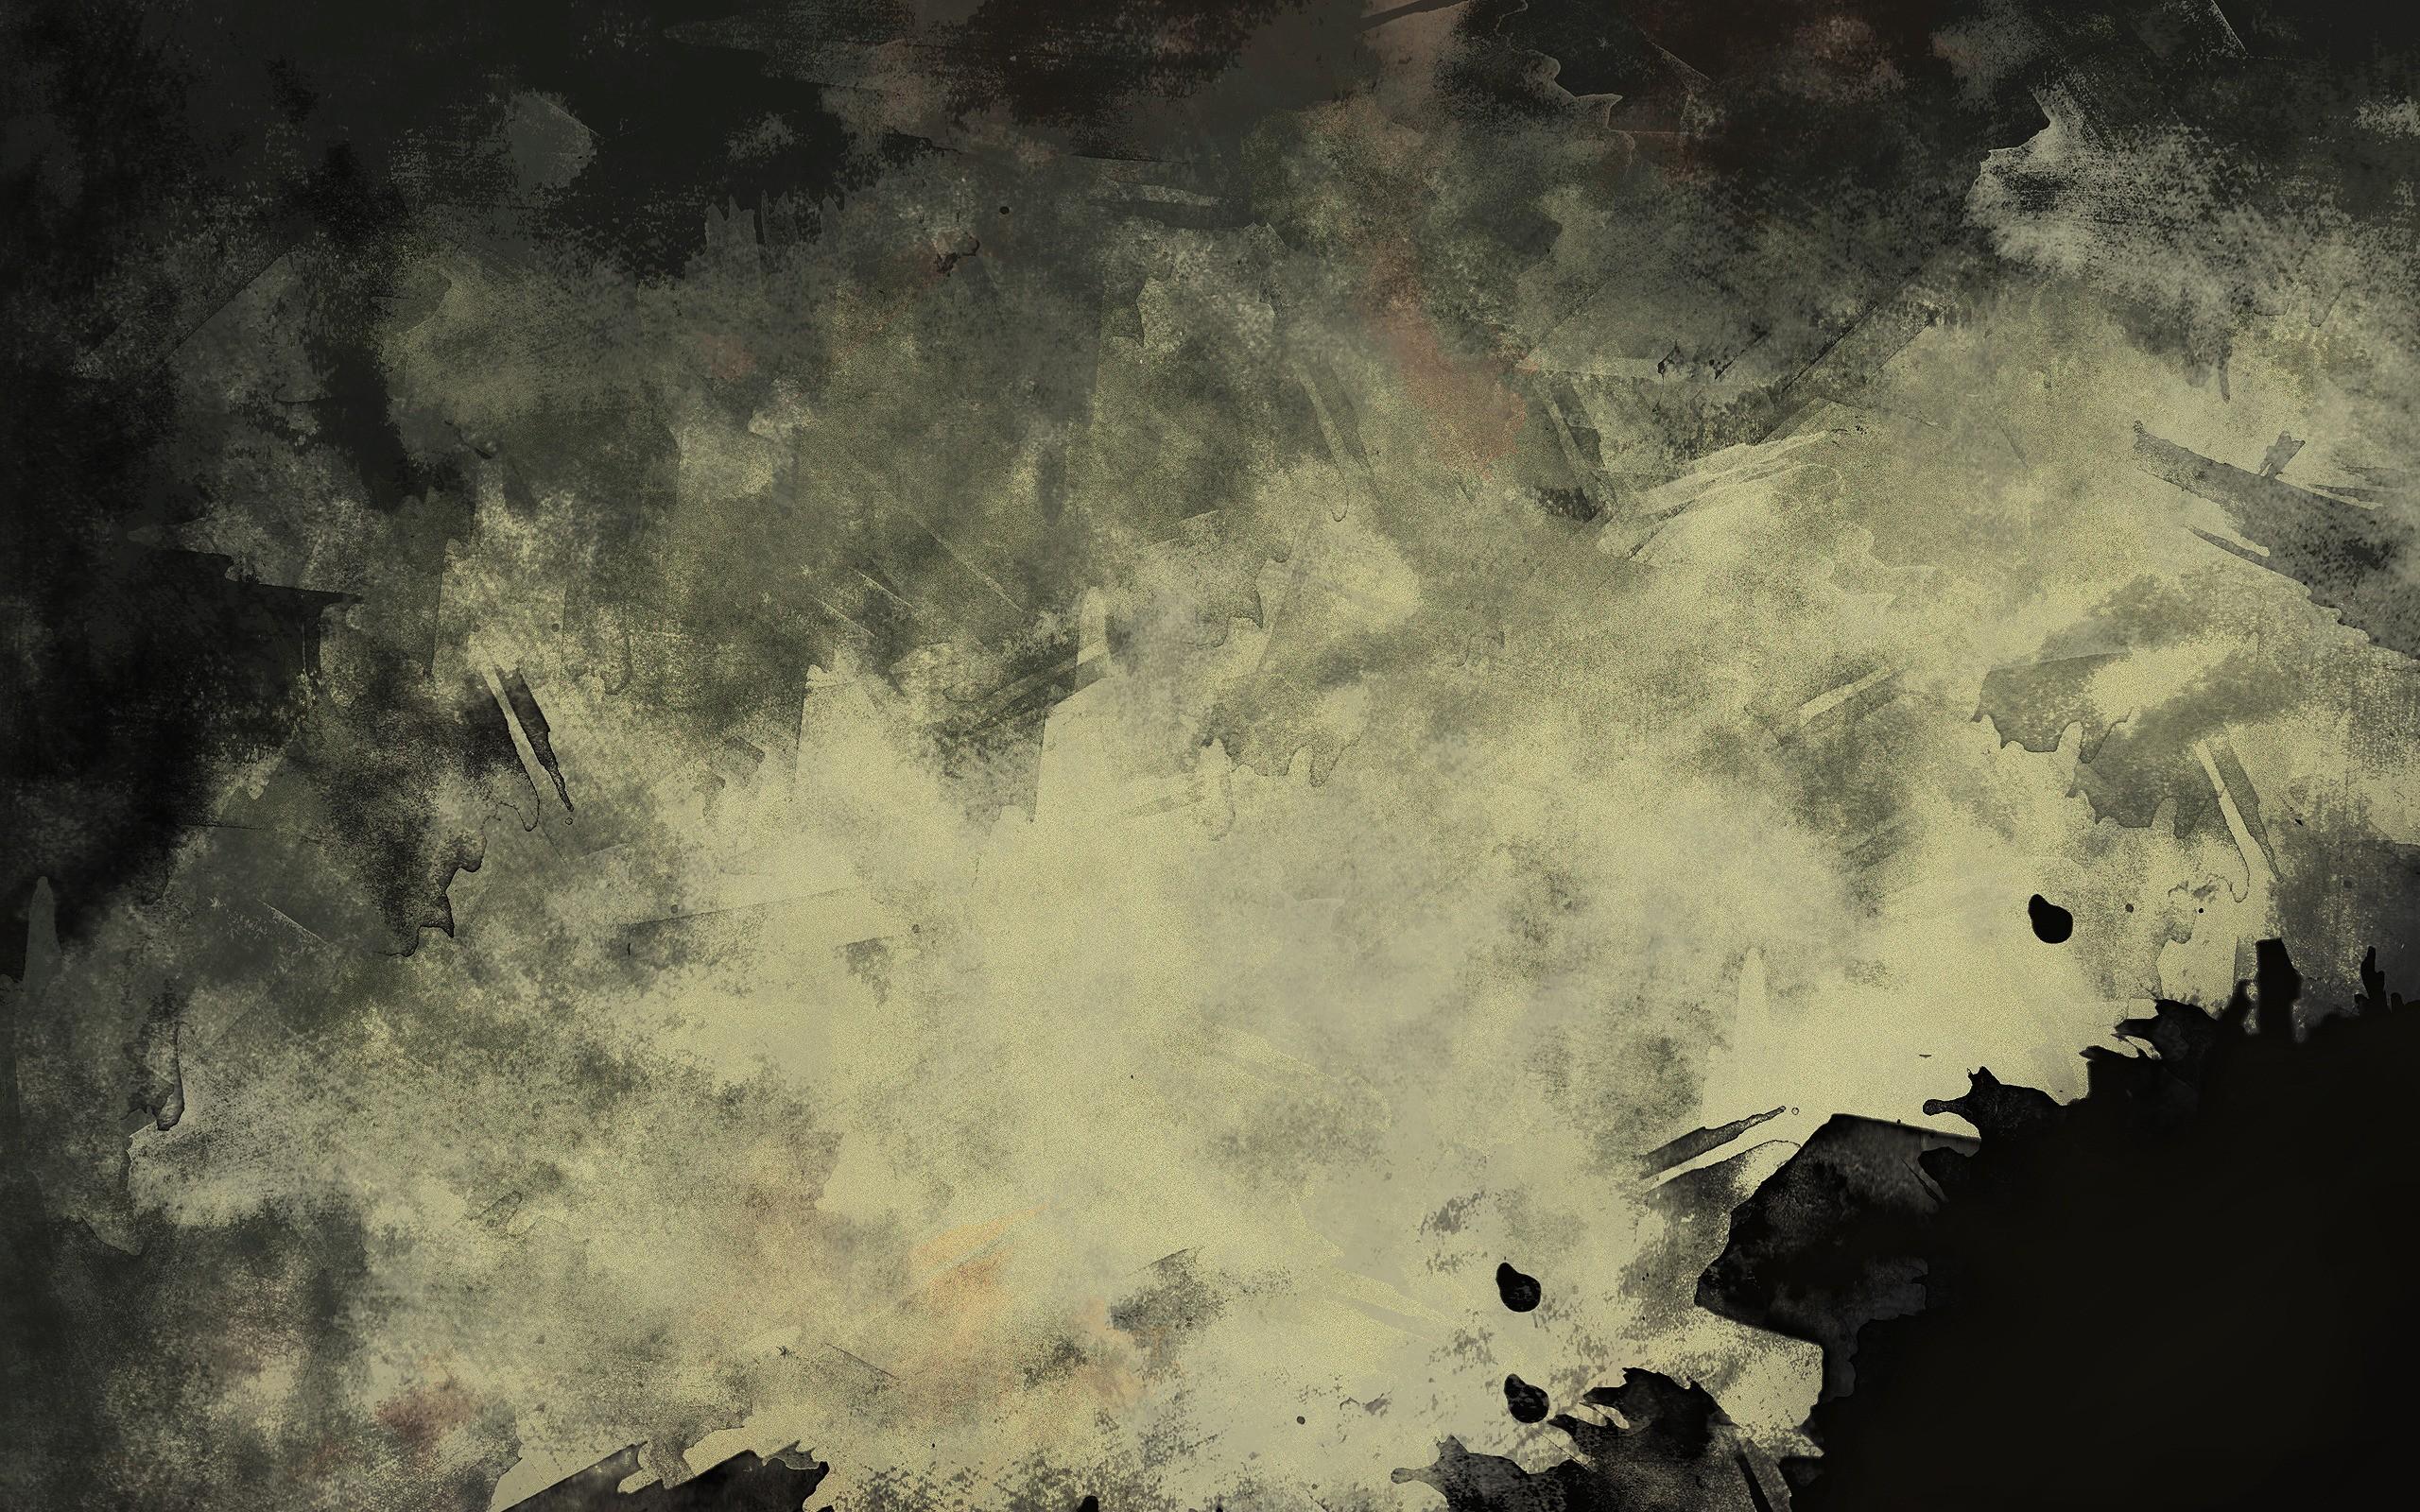 Minimalistic grunge textures wallpaper | 2560x1600 | 12522 ...